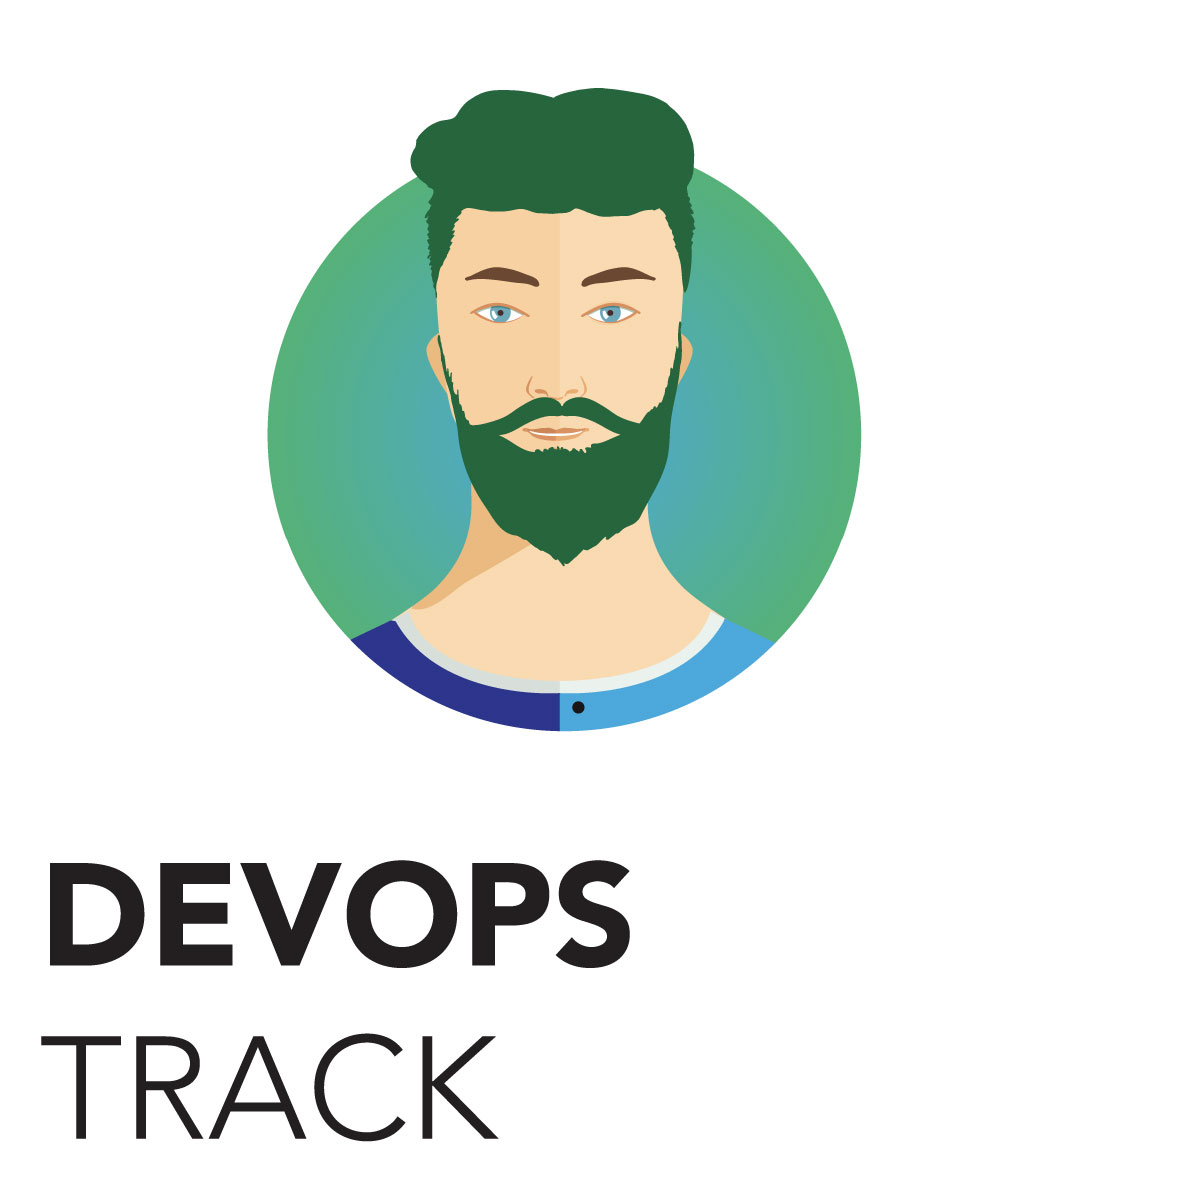 DevOps Track